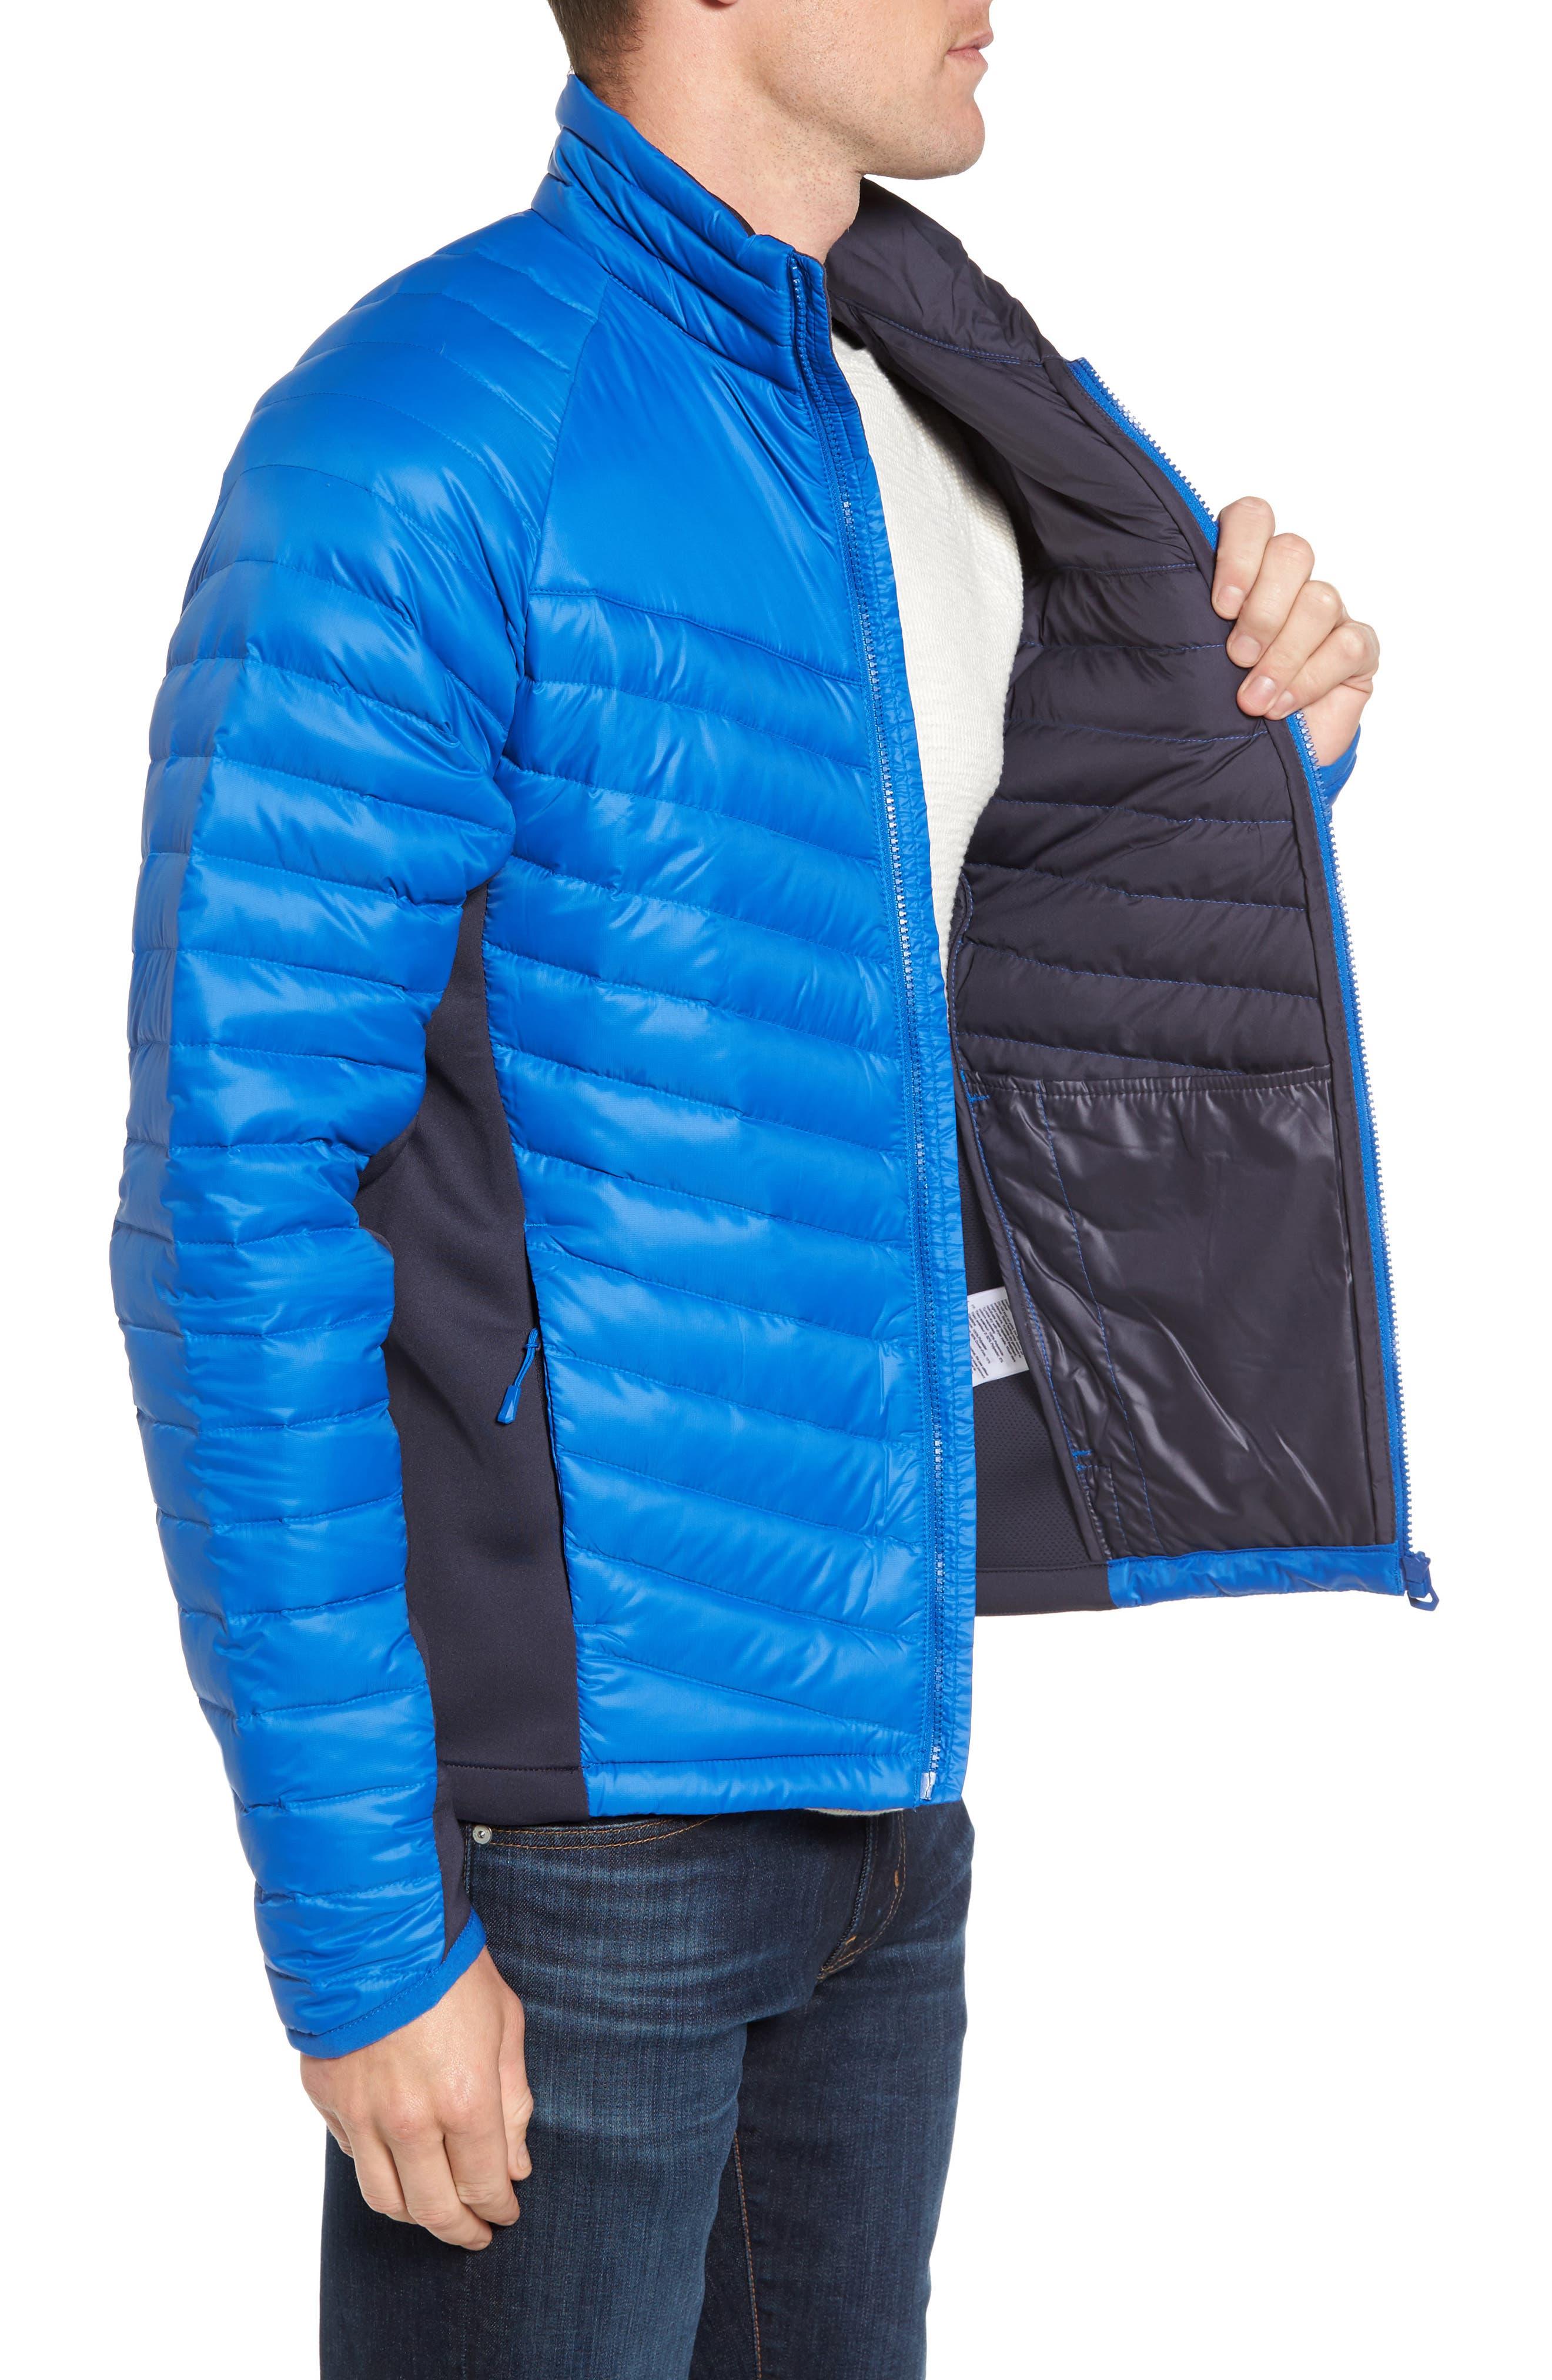 Verglas Insulator Hybrid Jacket,                             Alternate thumbnail 3, color,                             563 Olympian Blue